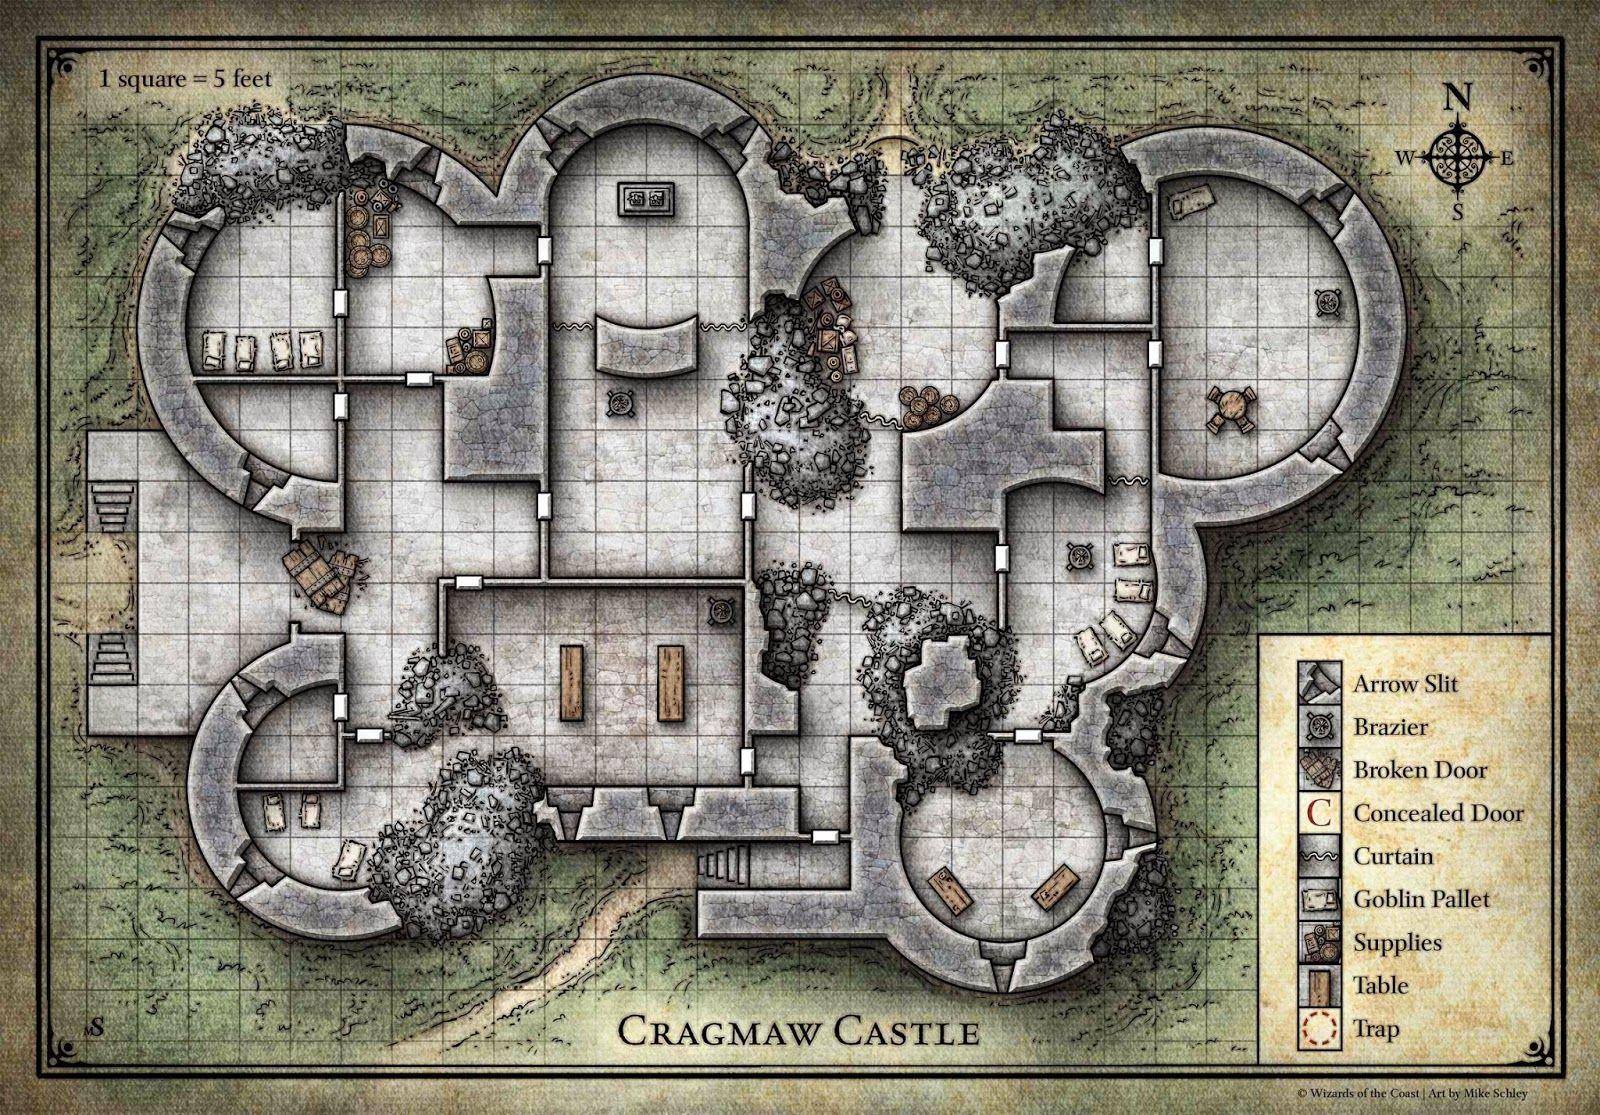 photo regarding Cragmaw Hideout Printable Map named My Realms: Beginner Fixed Sandbox 5 - Cragmaw Hideout, Cragmaw